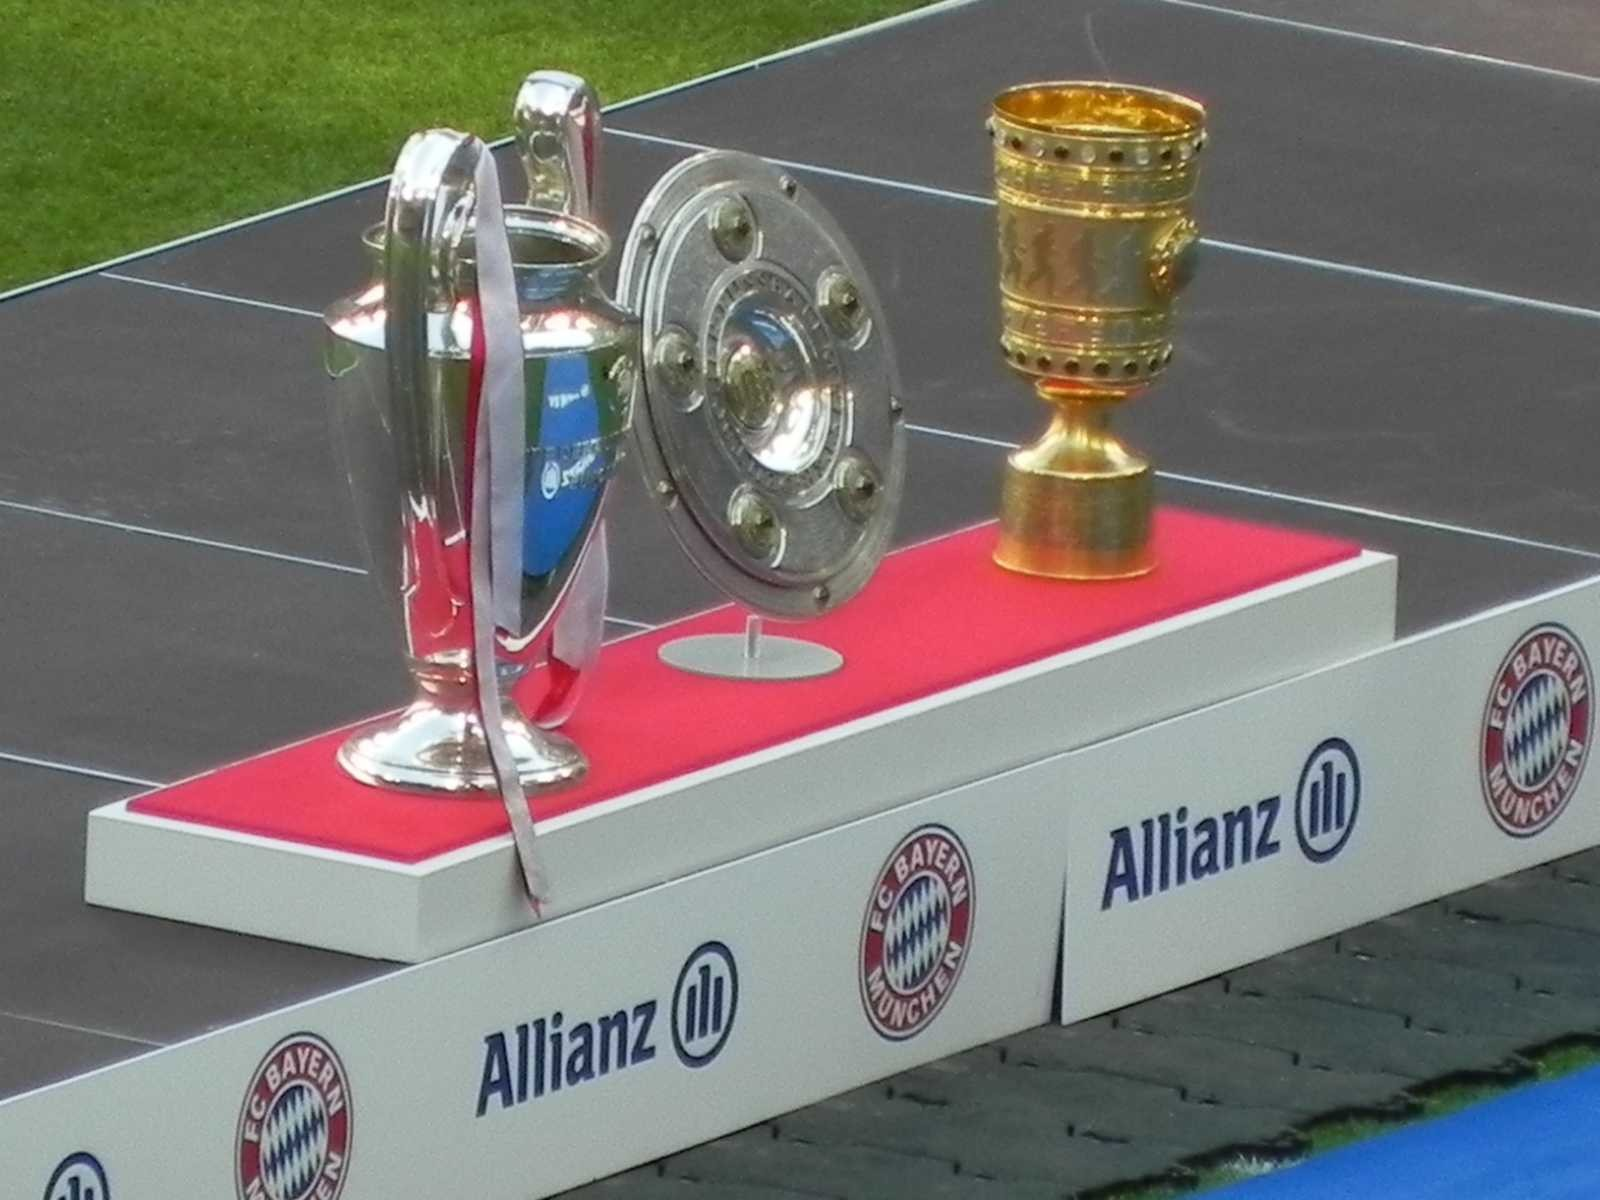 Das Trippl des FC Bayern - DFB Pokal Deutsche Meisterschale Meisterschaft Champions league - MAURICE - Fussballsammlung 2013